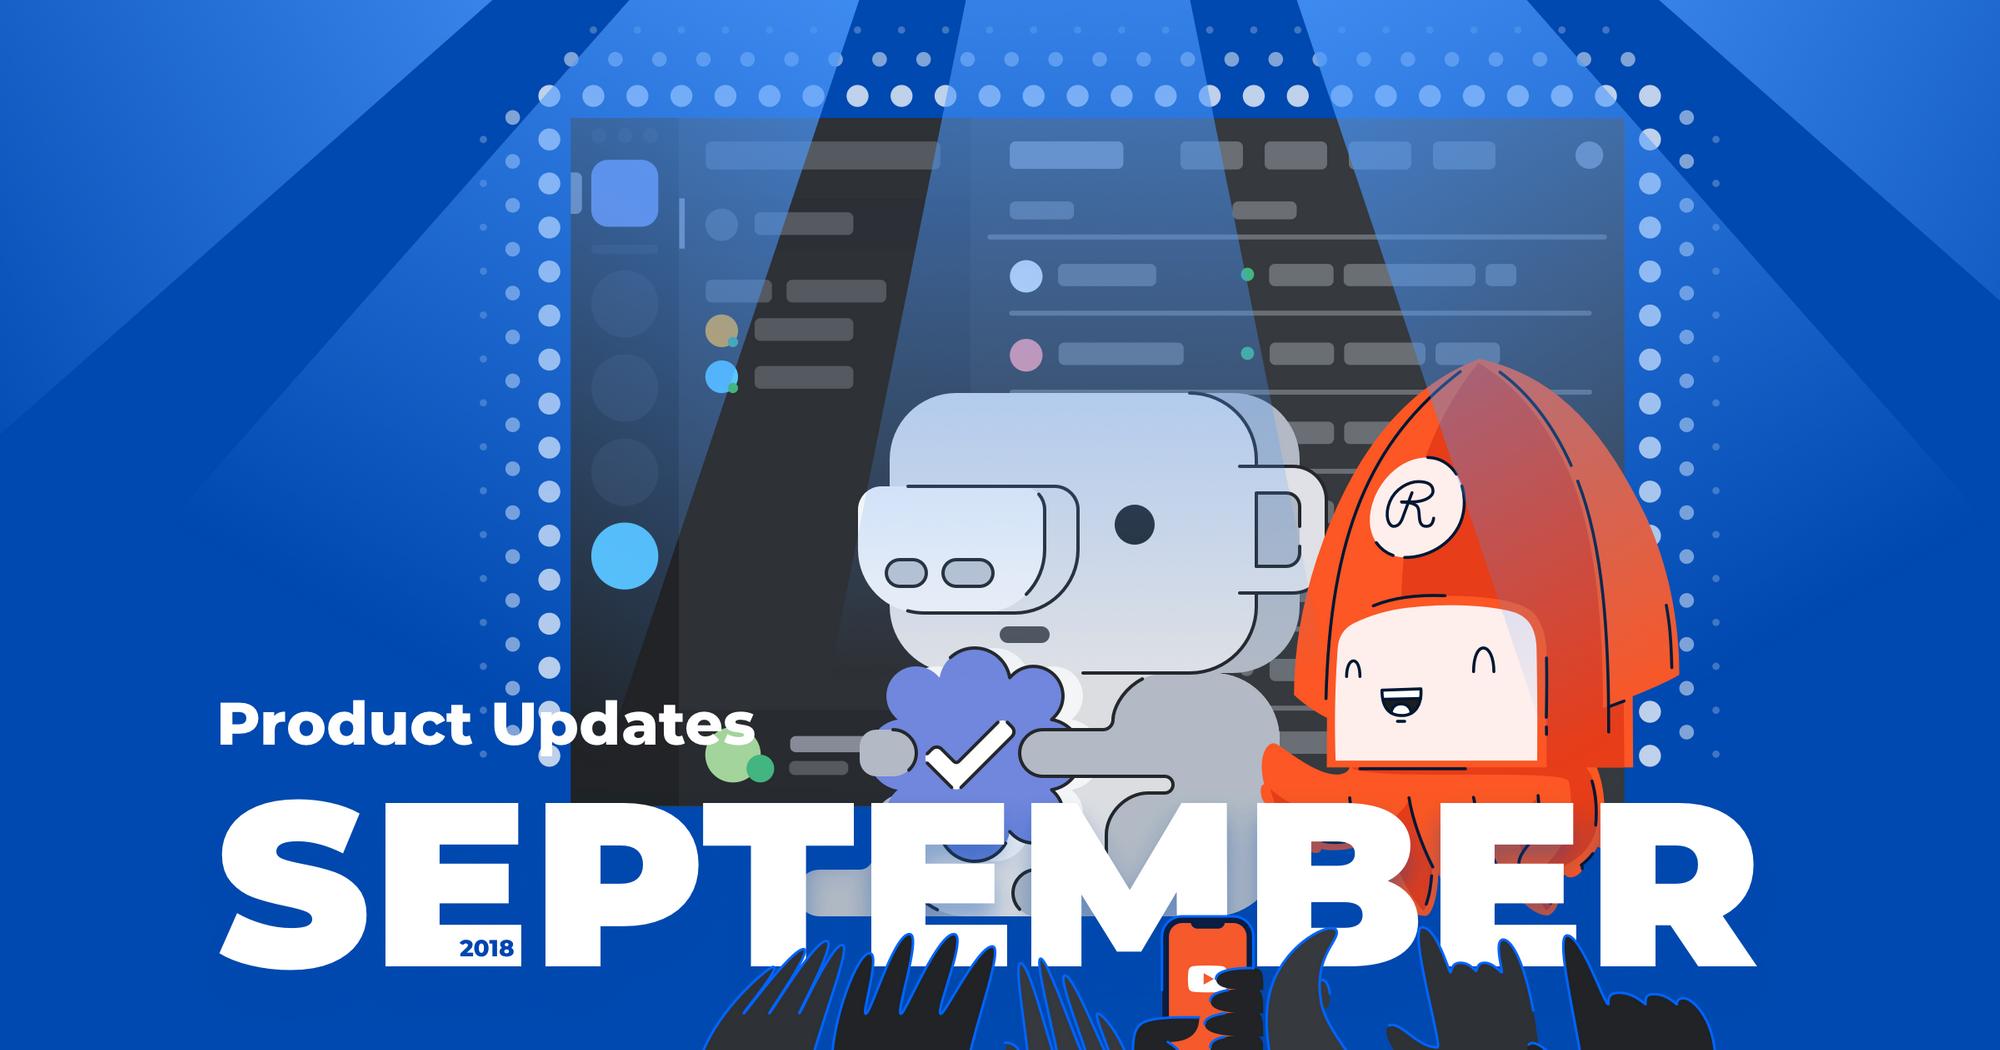 Restream september product updates